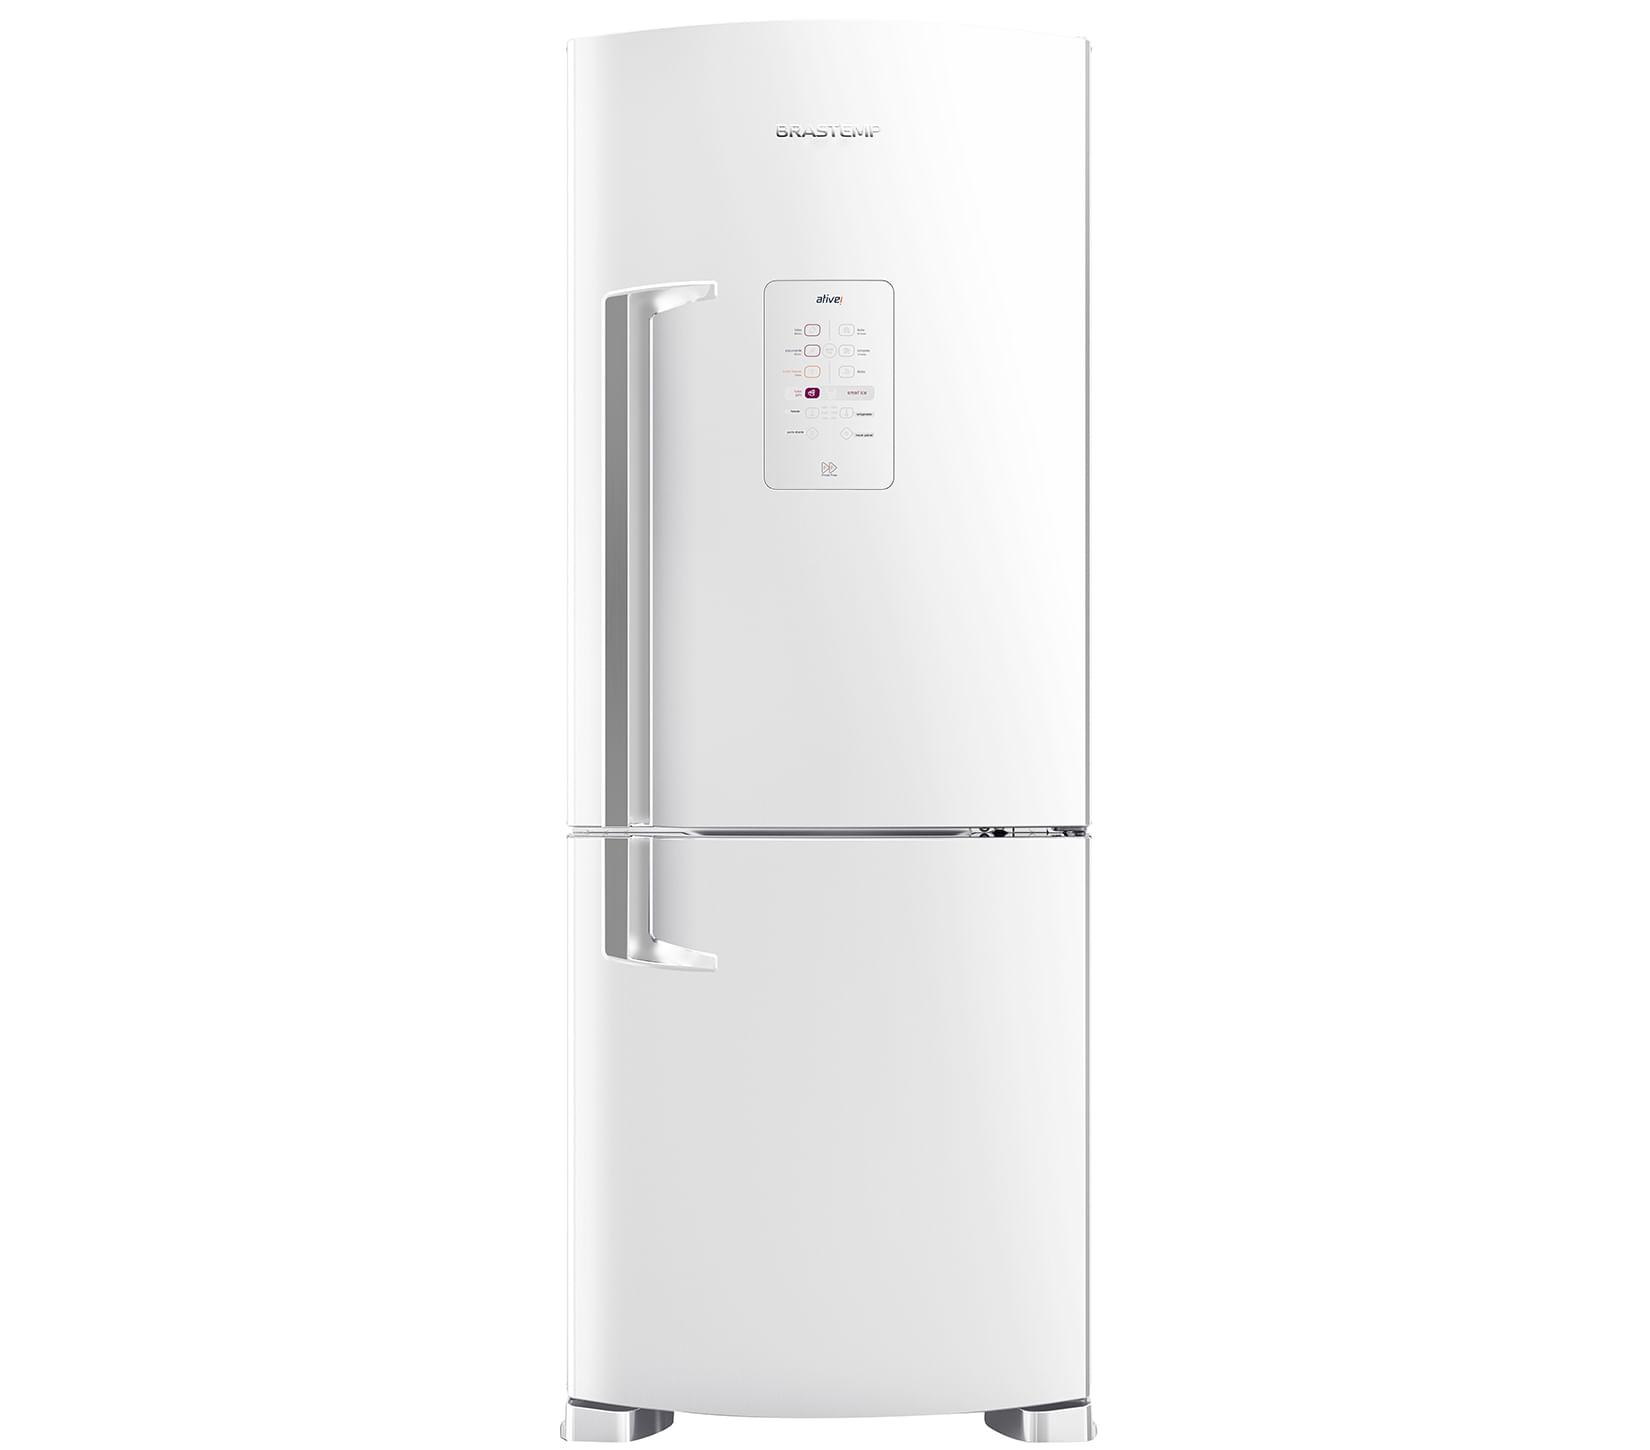 Geladeira Brastemp Frost Free Inverse 422 litros Branca com Smart Ice